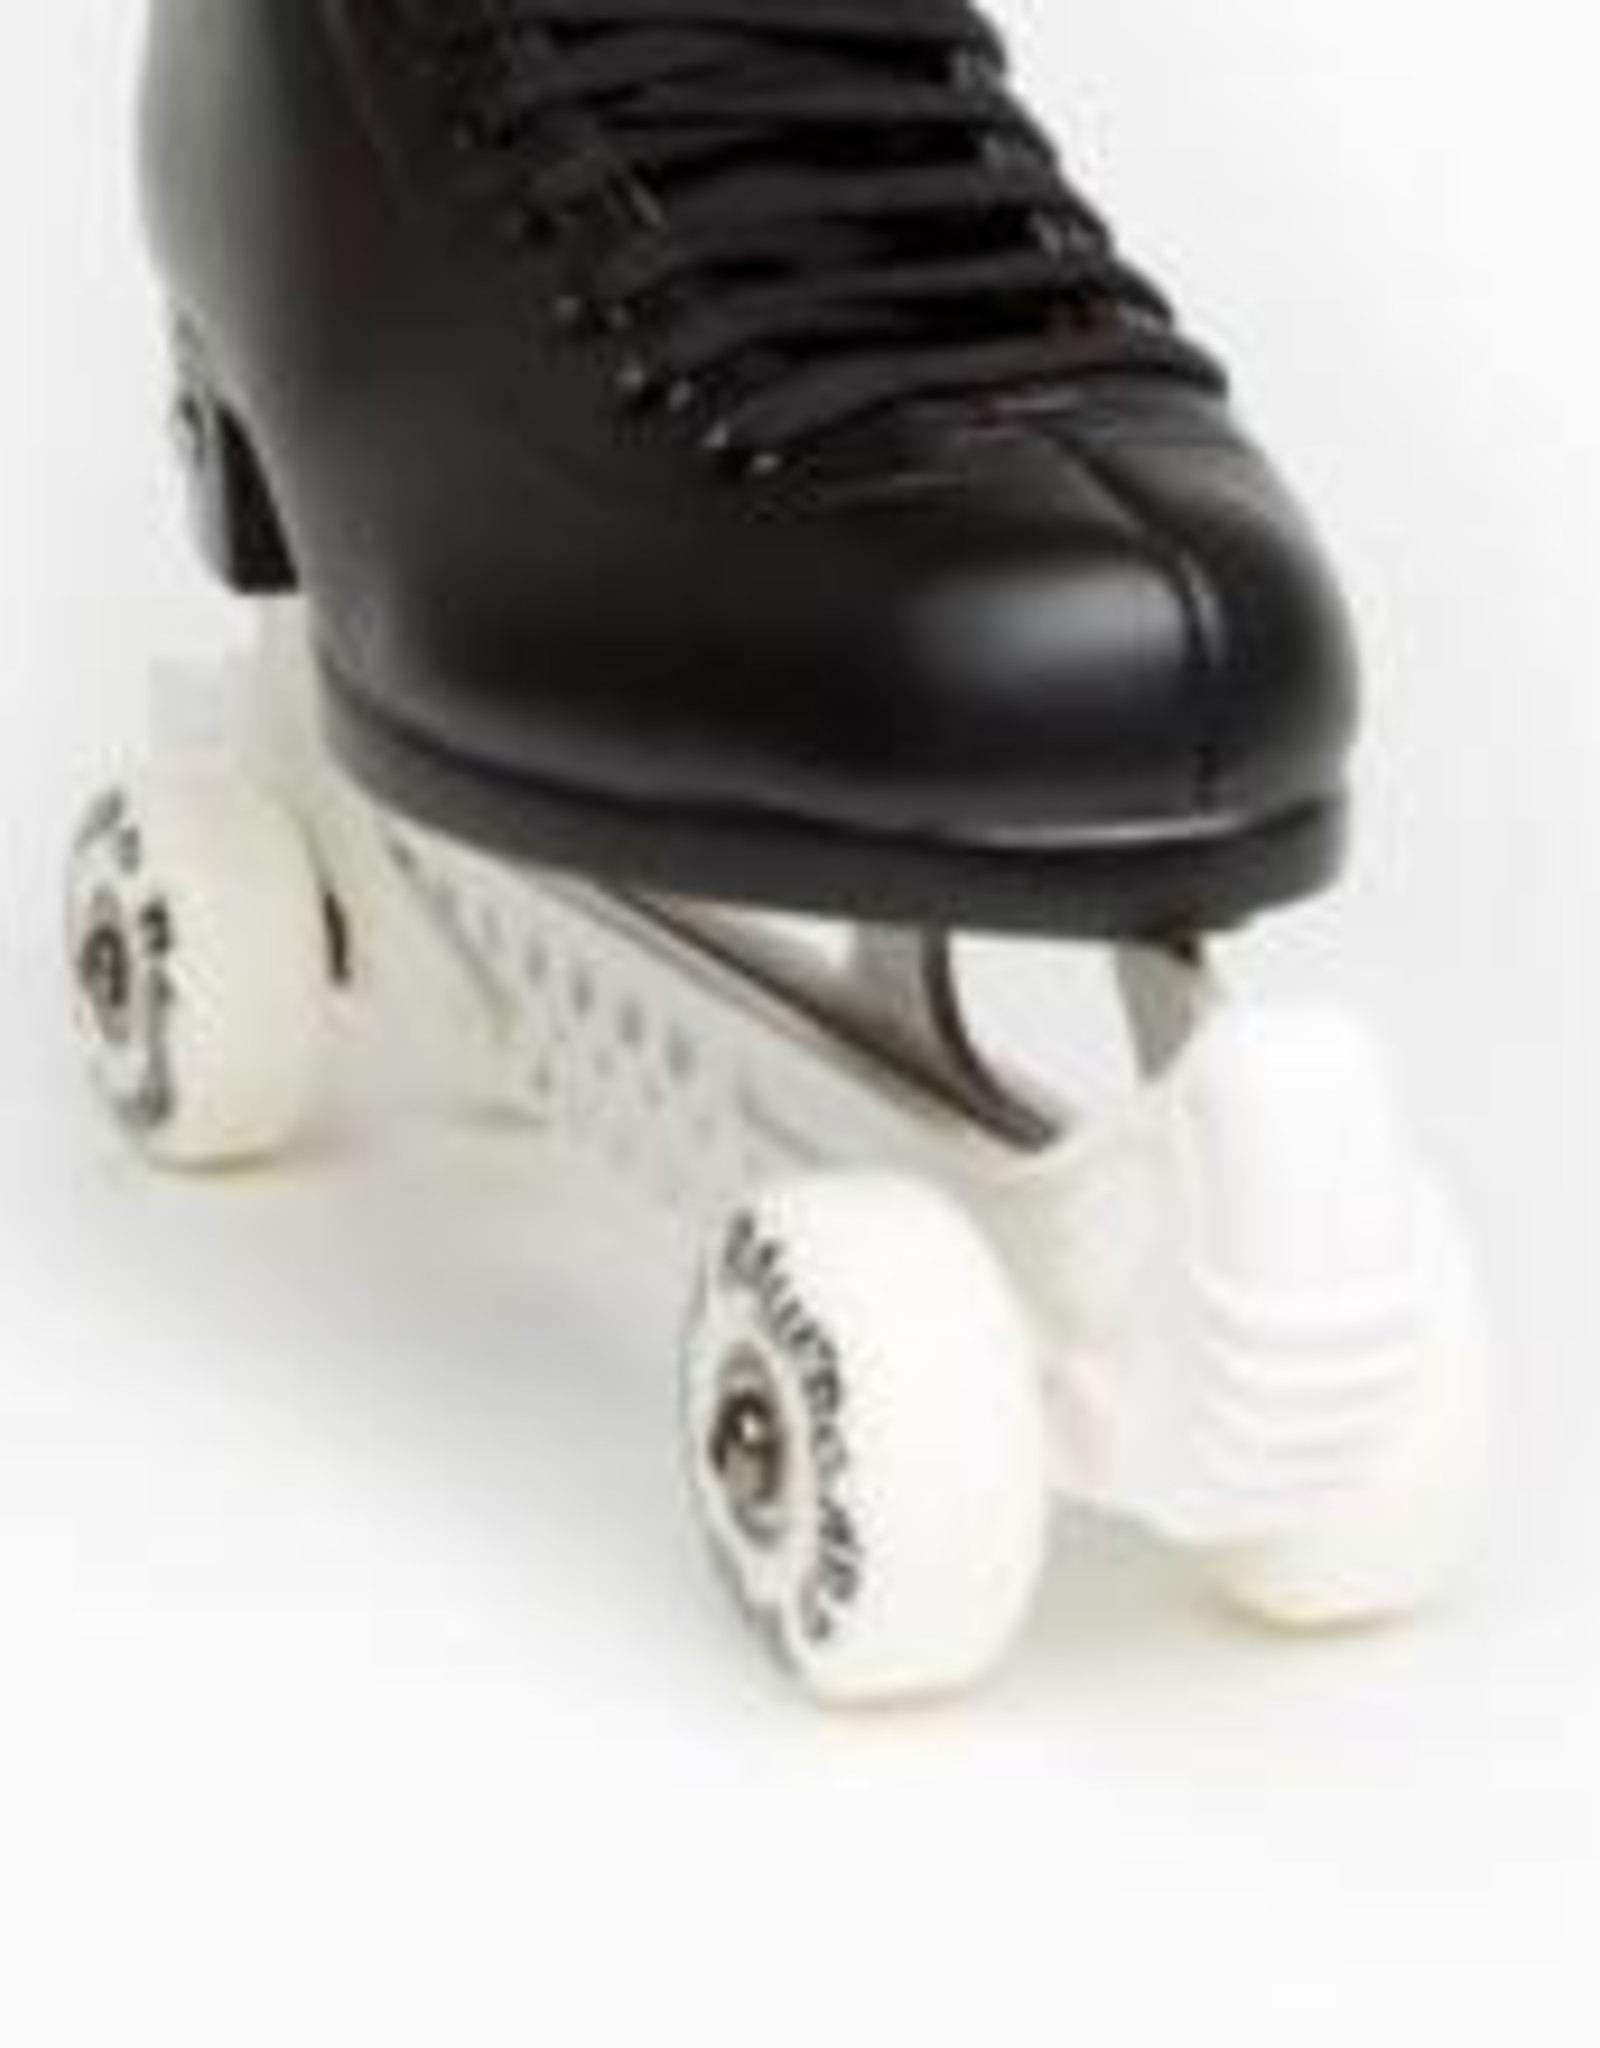 Rollerguard Rollerguard Figure Skating